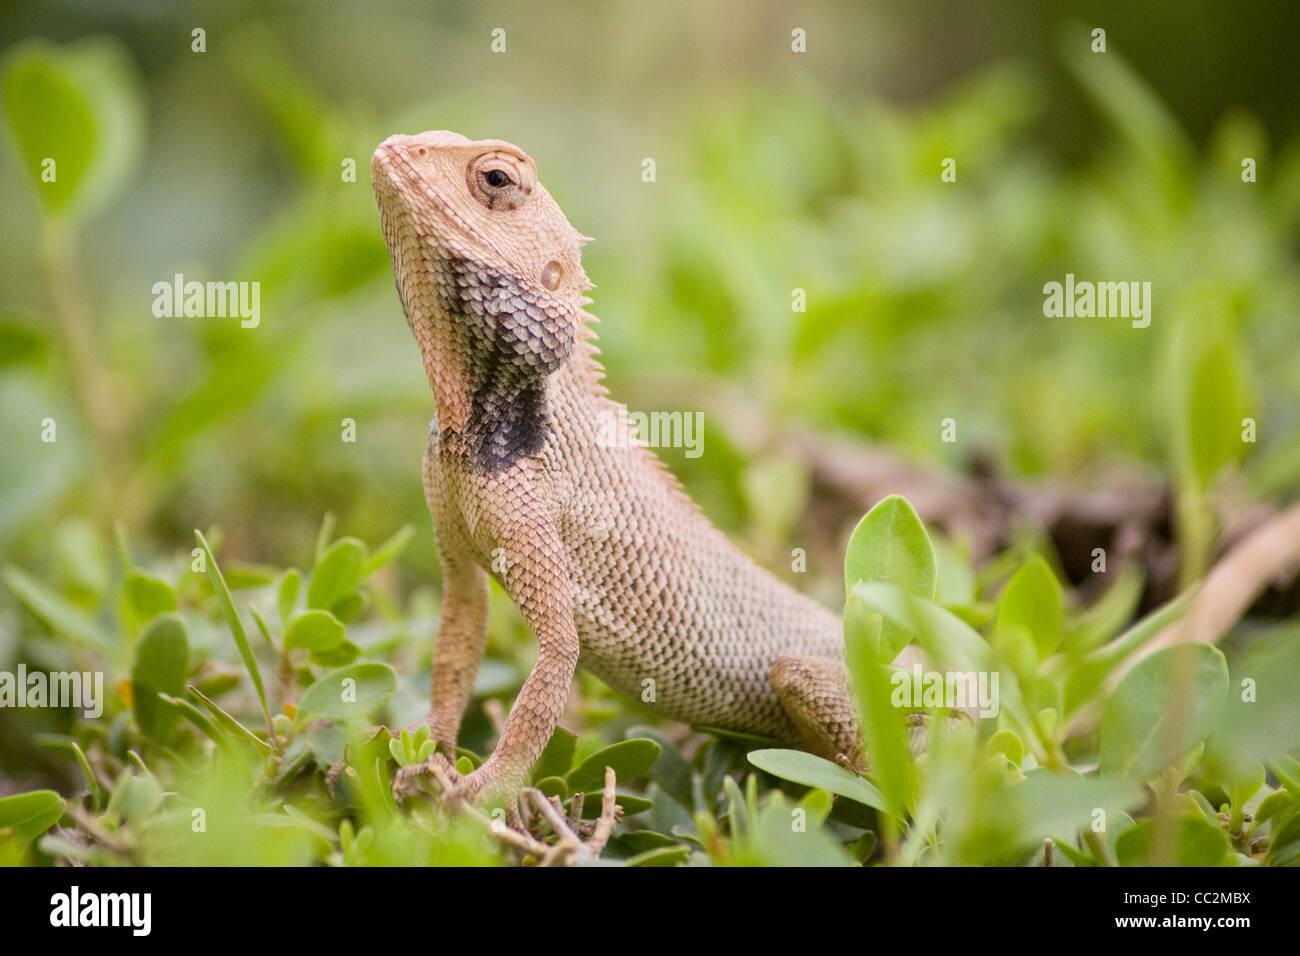 Oriental Garden Lizard, Ranthambore India   Stock Image